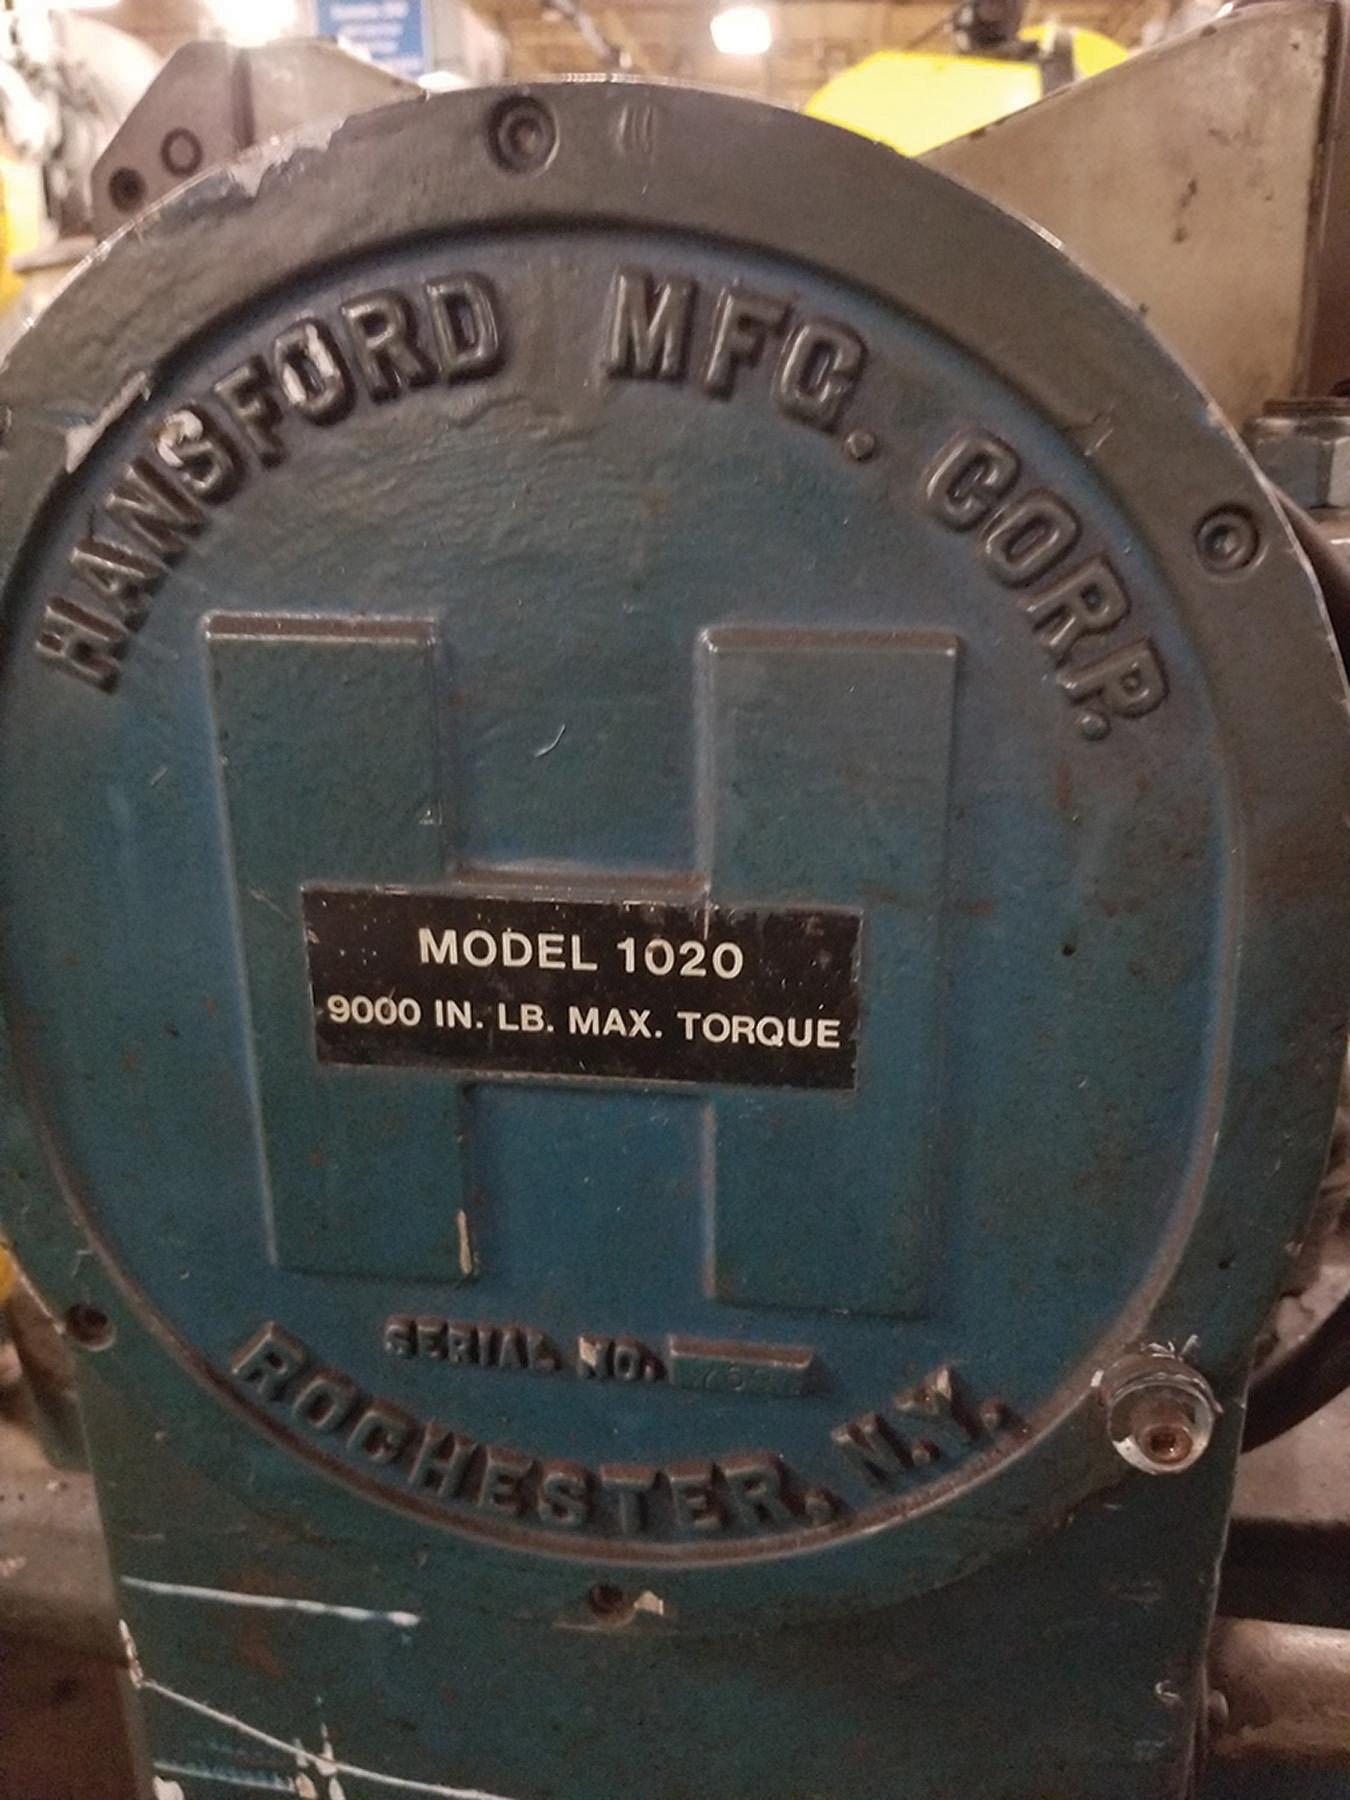 Lot 38A - HANSFORD DIE HANDLER, MODEL 1020, 9,000 IN. LB. MAX TORQUE, S/N 769 ***$75.00 RIGGING FEE***